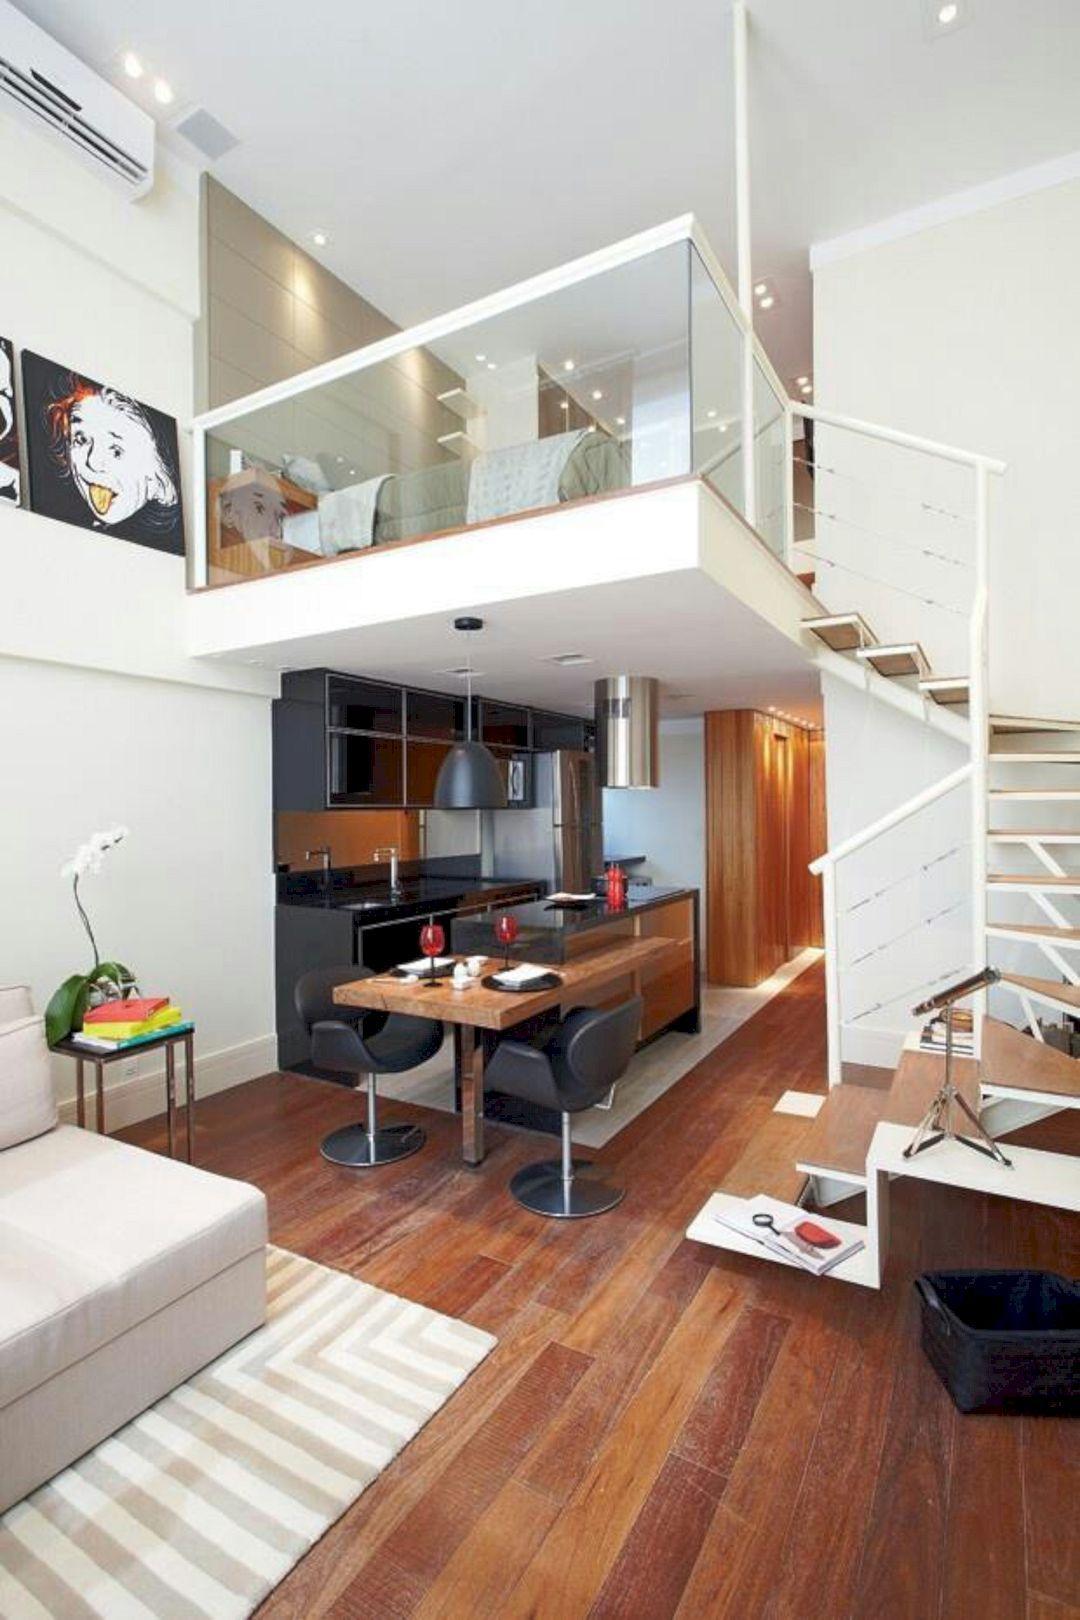 V20 Apartment: Modern Architecture And Scandinavian Interior Design Of A  Bright Apartment | Futurist Architecture